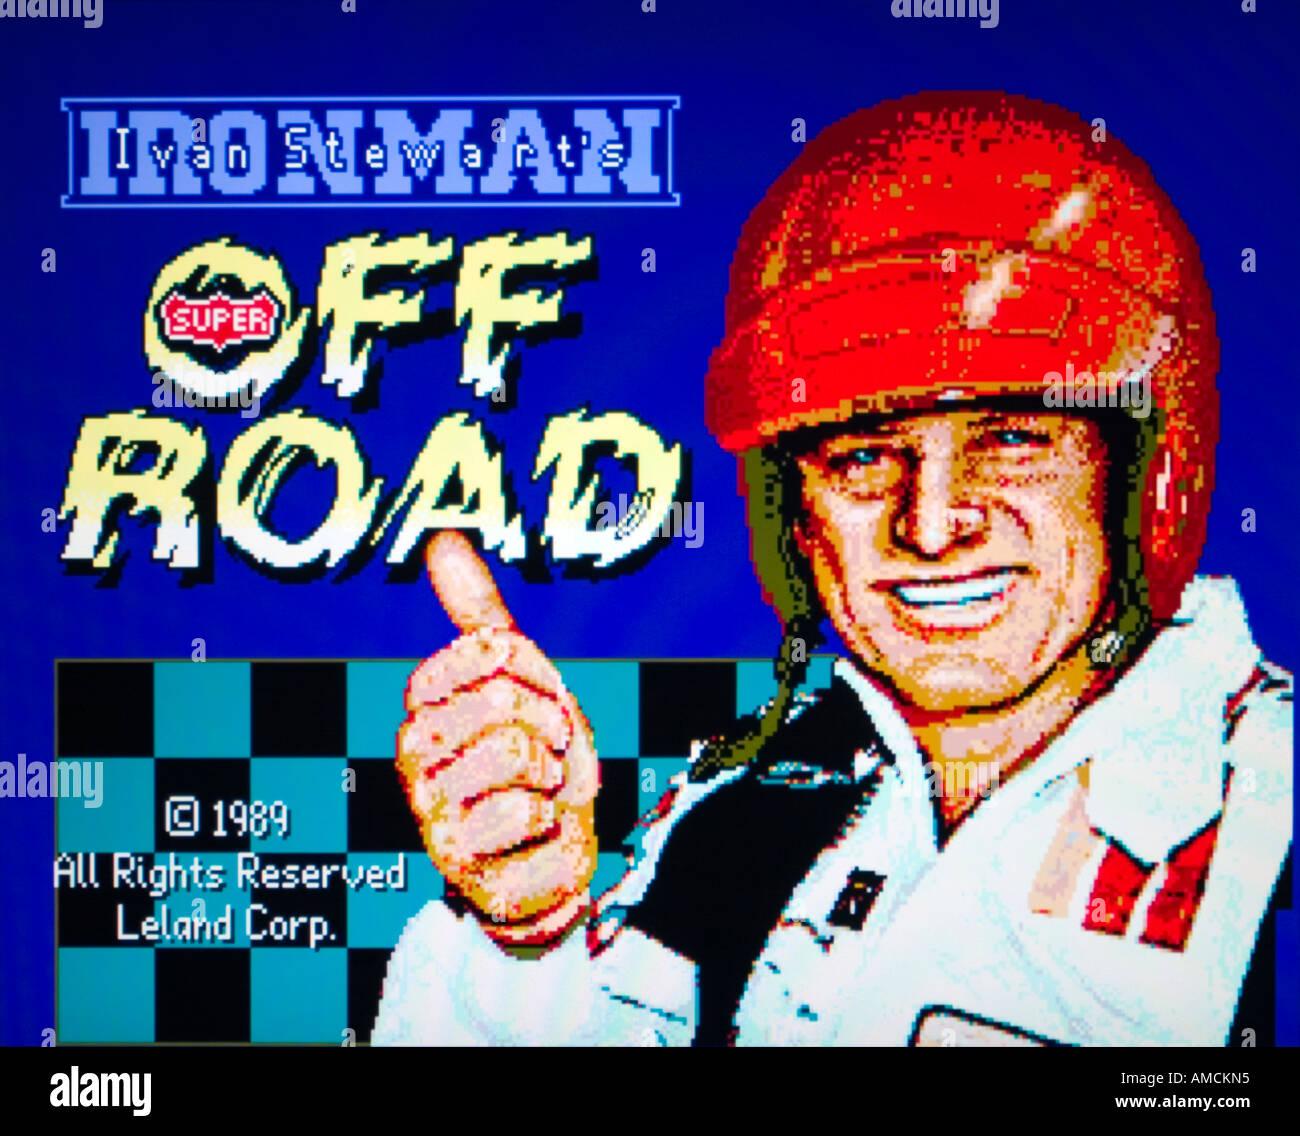 Iron Man Ironman Ivan Stewart s Off Road Leland Corp 1989 vintage videojuego arcade captura de pantalla - SÓLO PARA USO EDITORIAL Foto de stock